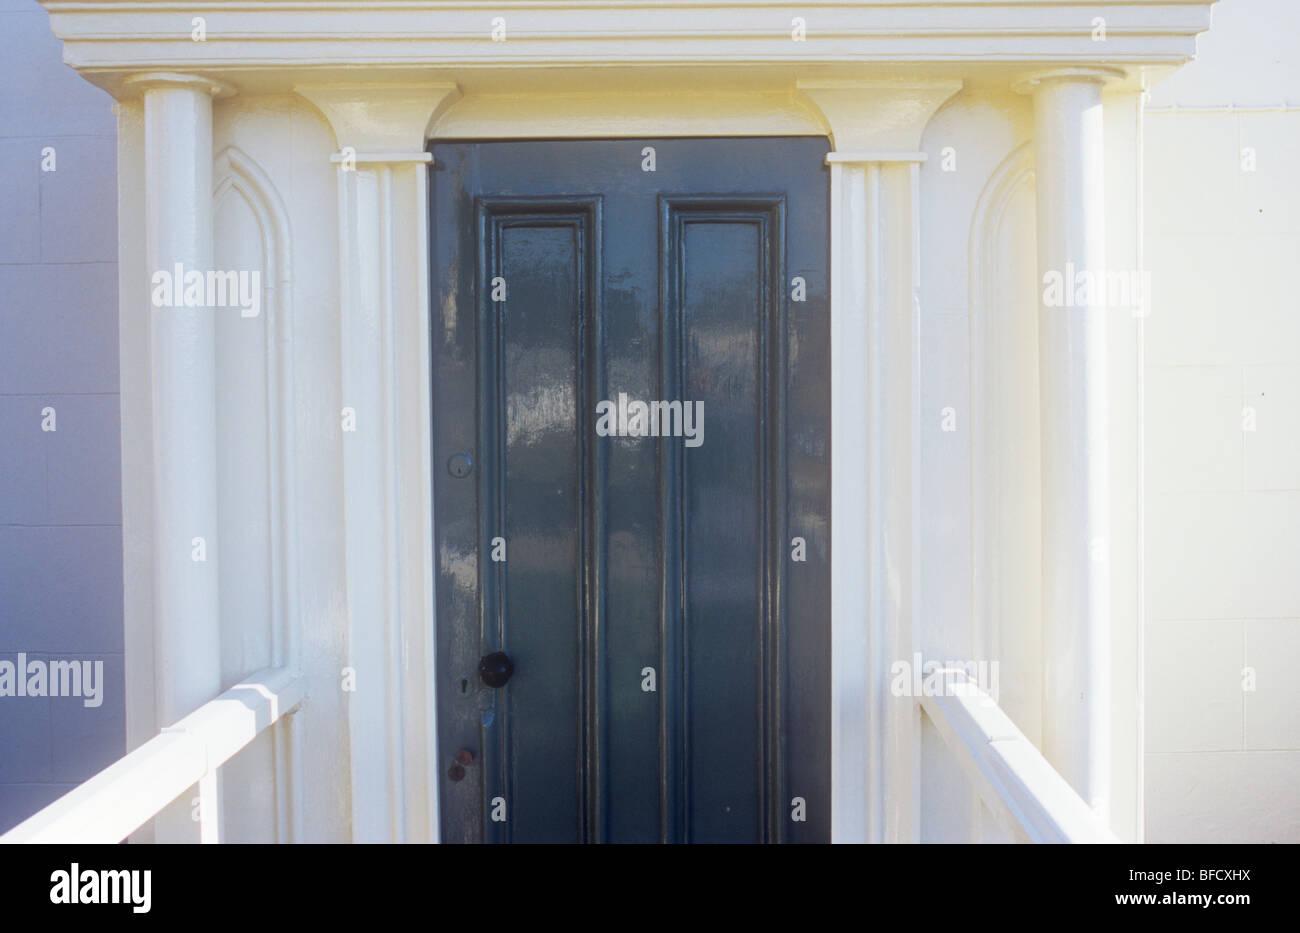 Stylish wooden front door painted dark grey with white painted stylish wooden front door painted dark grey with white painted pillars moulded half pillars portico and handrails rubansaba